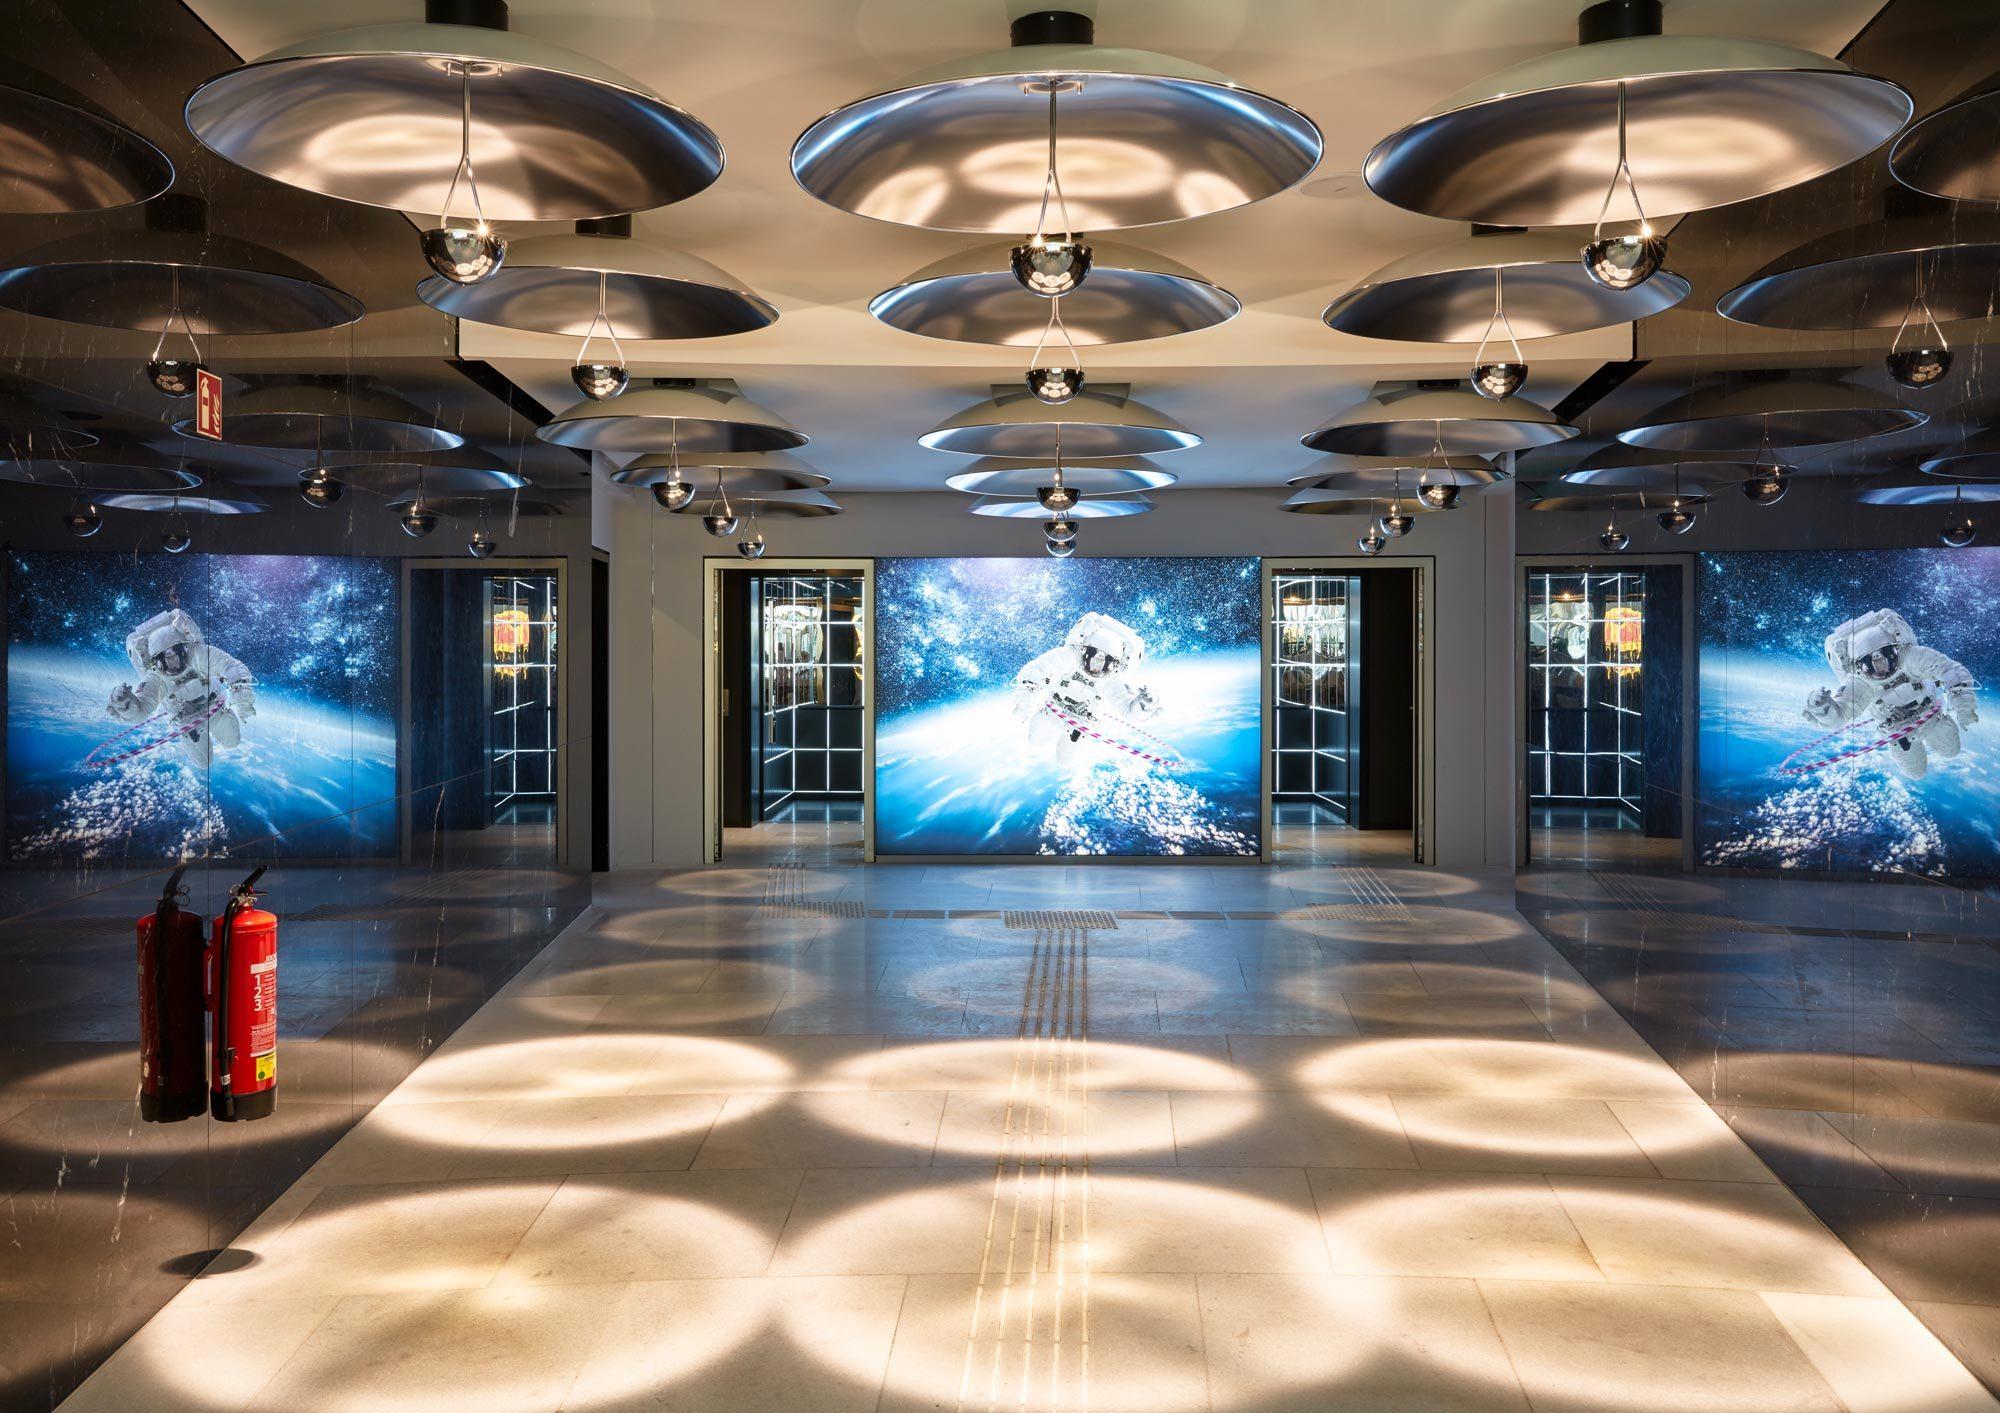 The Circle - 25hour Hotel, Köln, agLicht GbR, Foto: Steve Herud